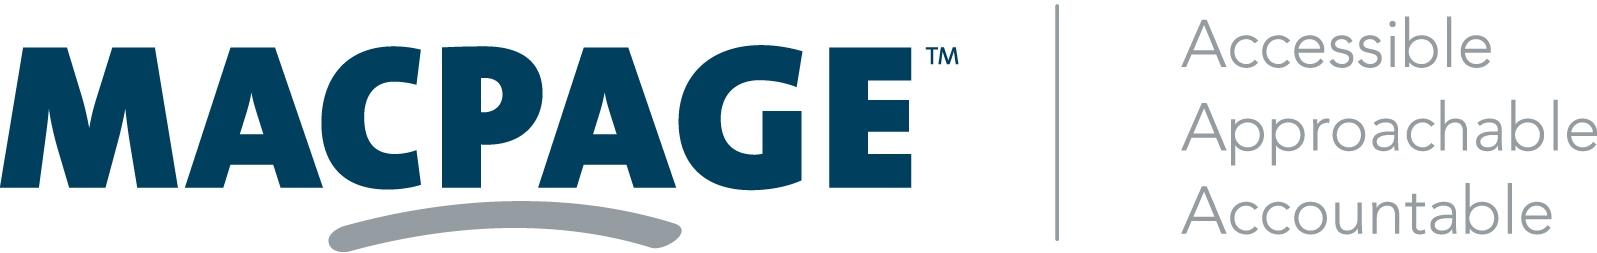 Macpage